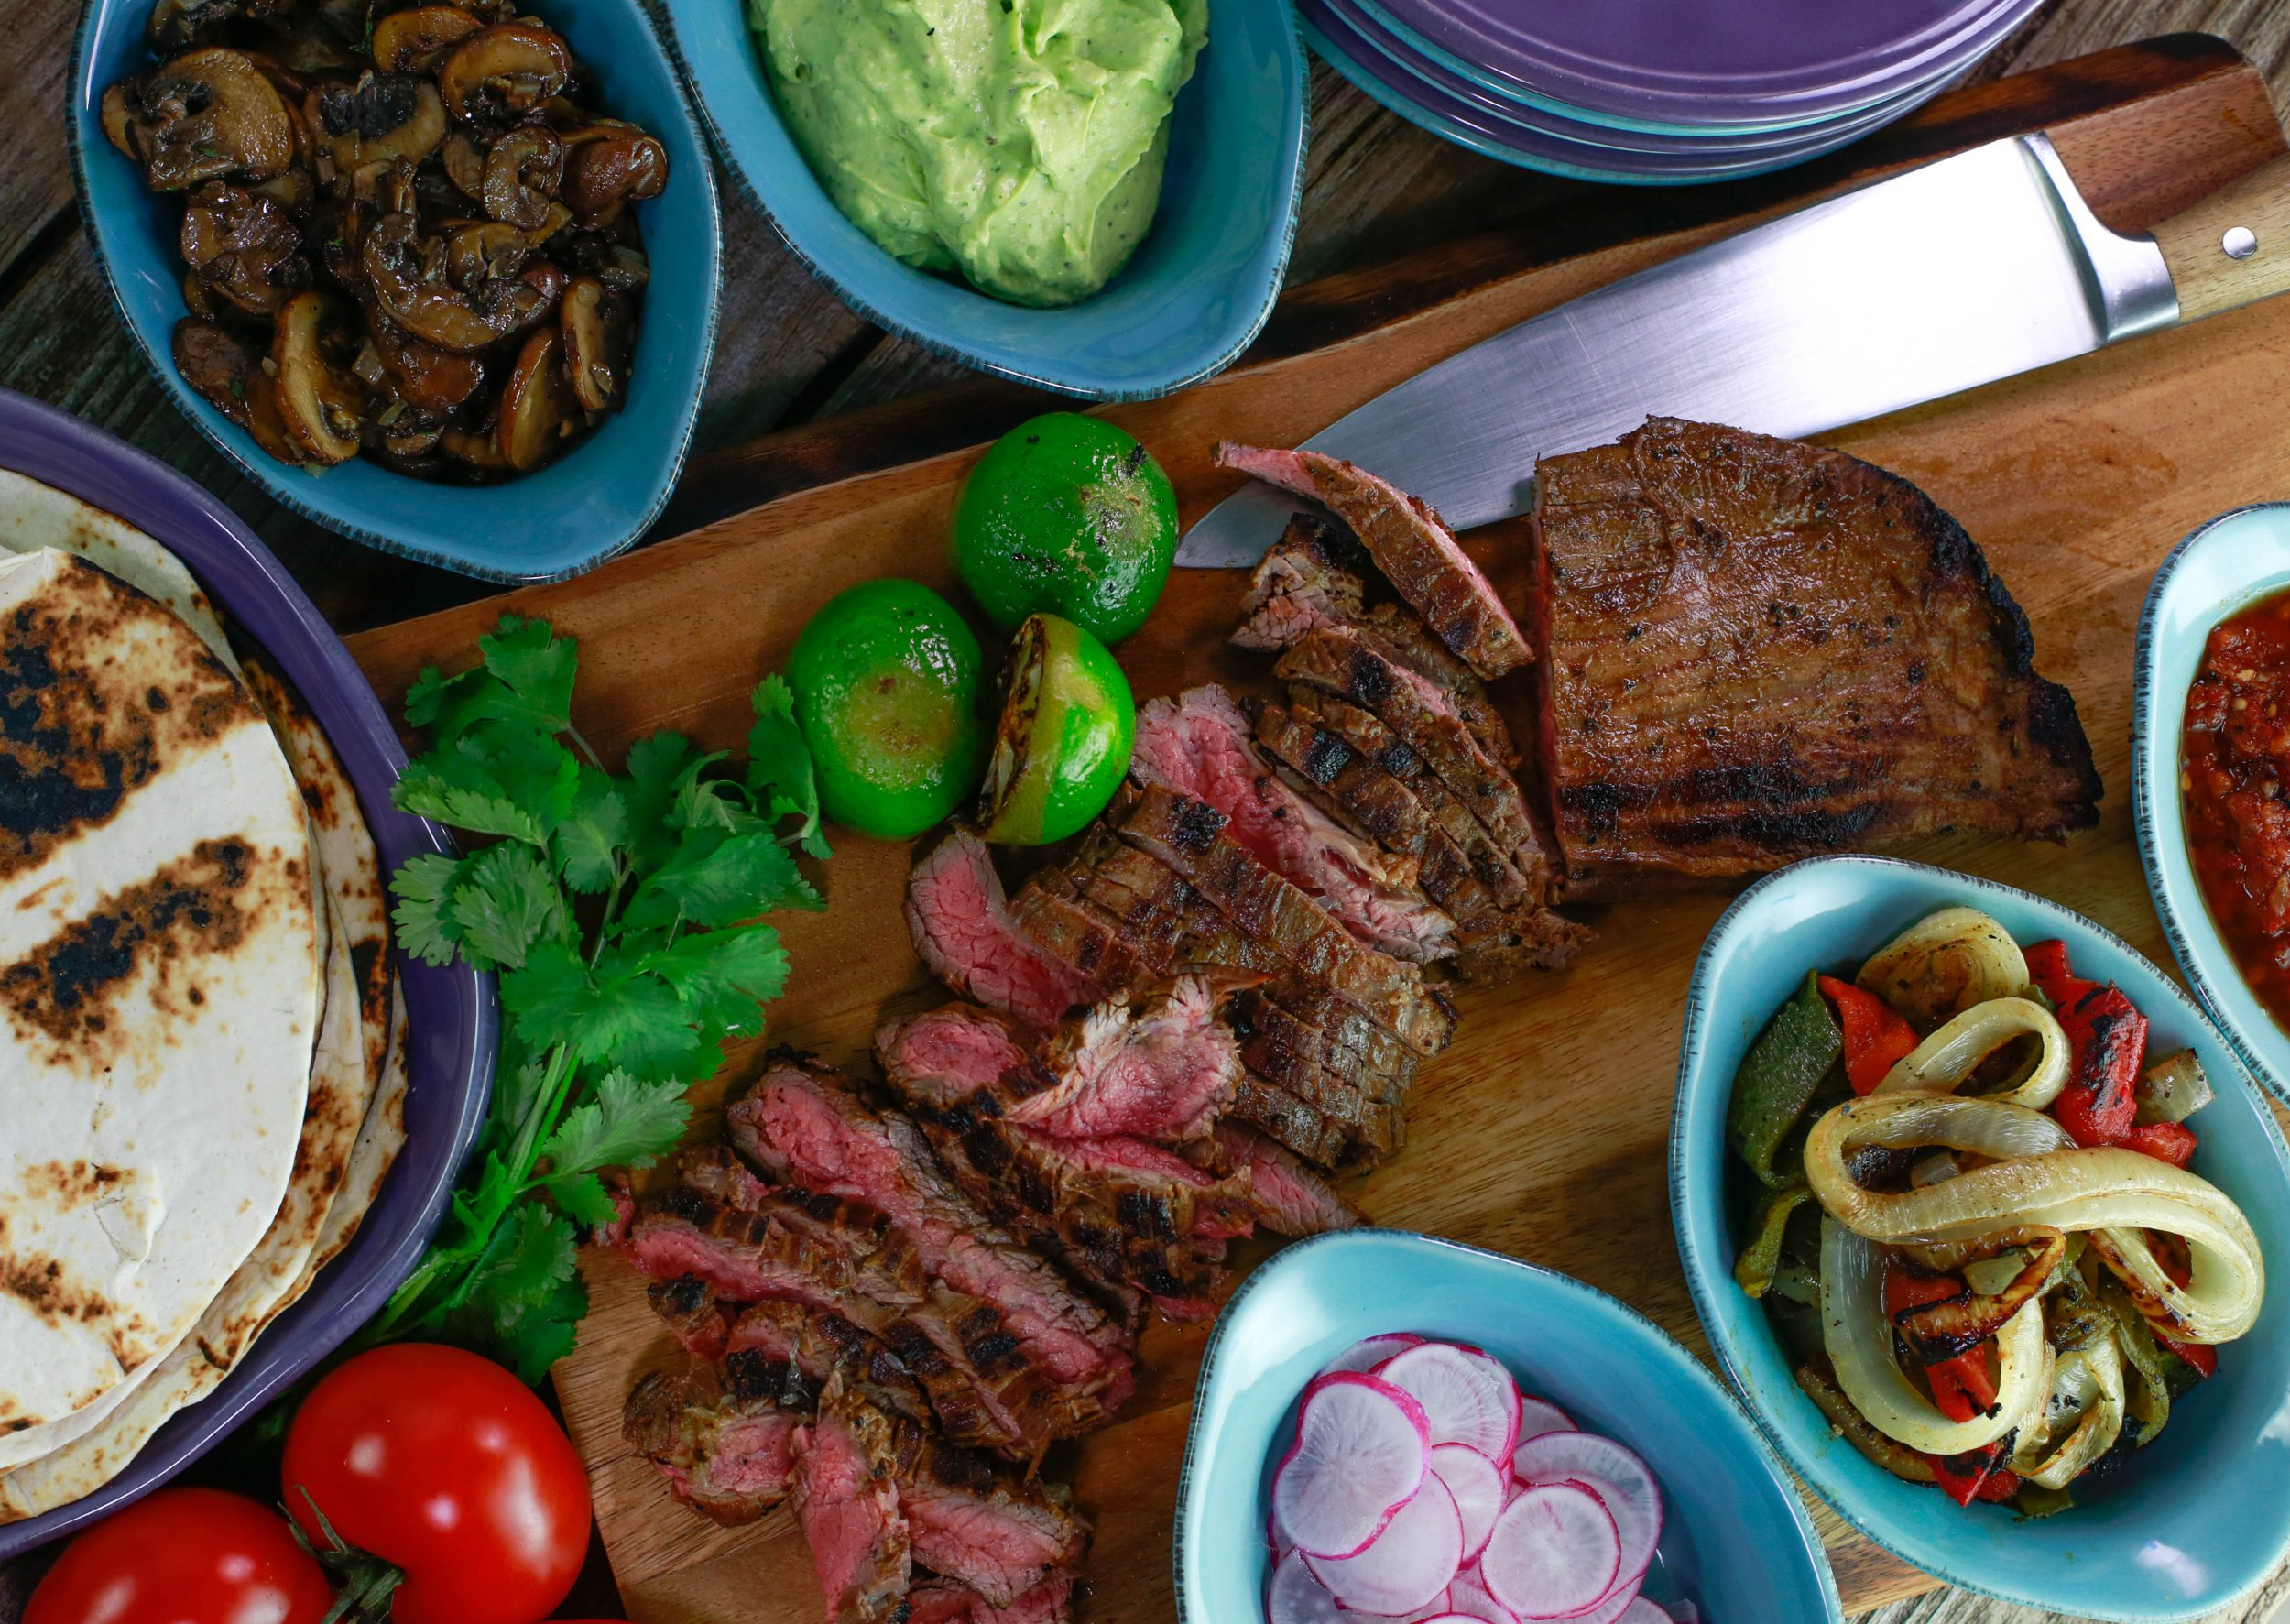 Steak Fajitas with Roasted Peppers, Onions, Sherry Mushrooms & Charred Tomato Sauce